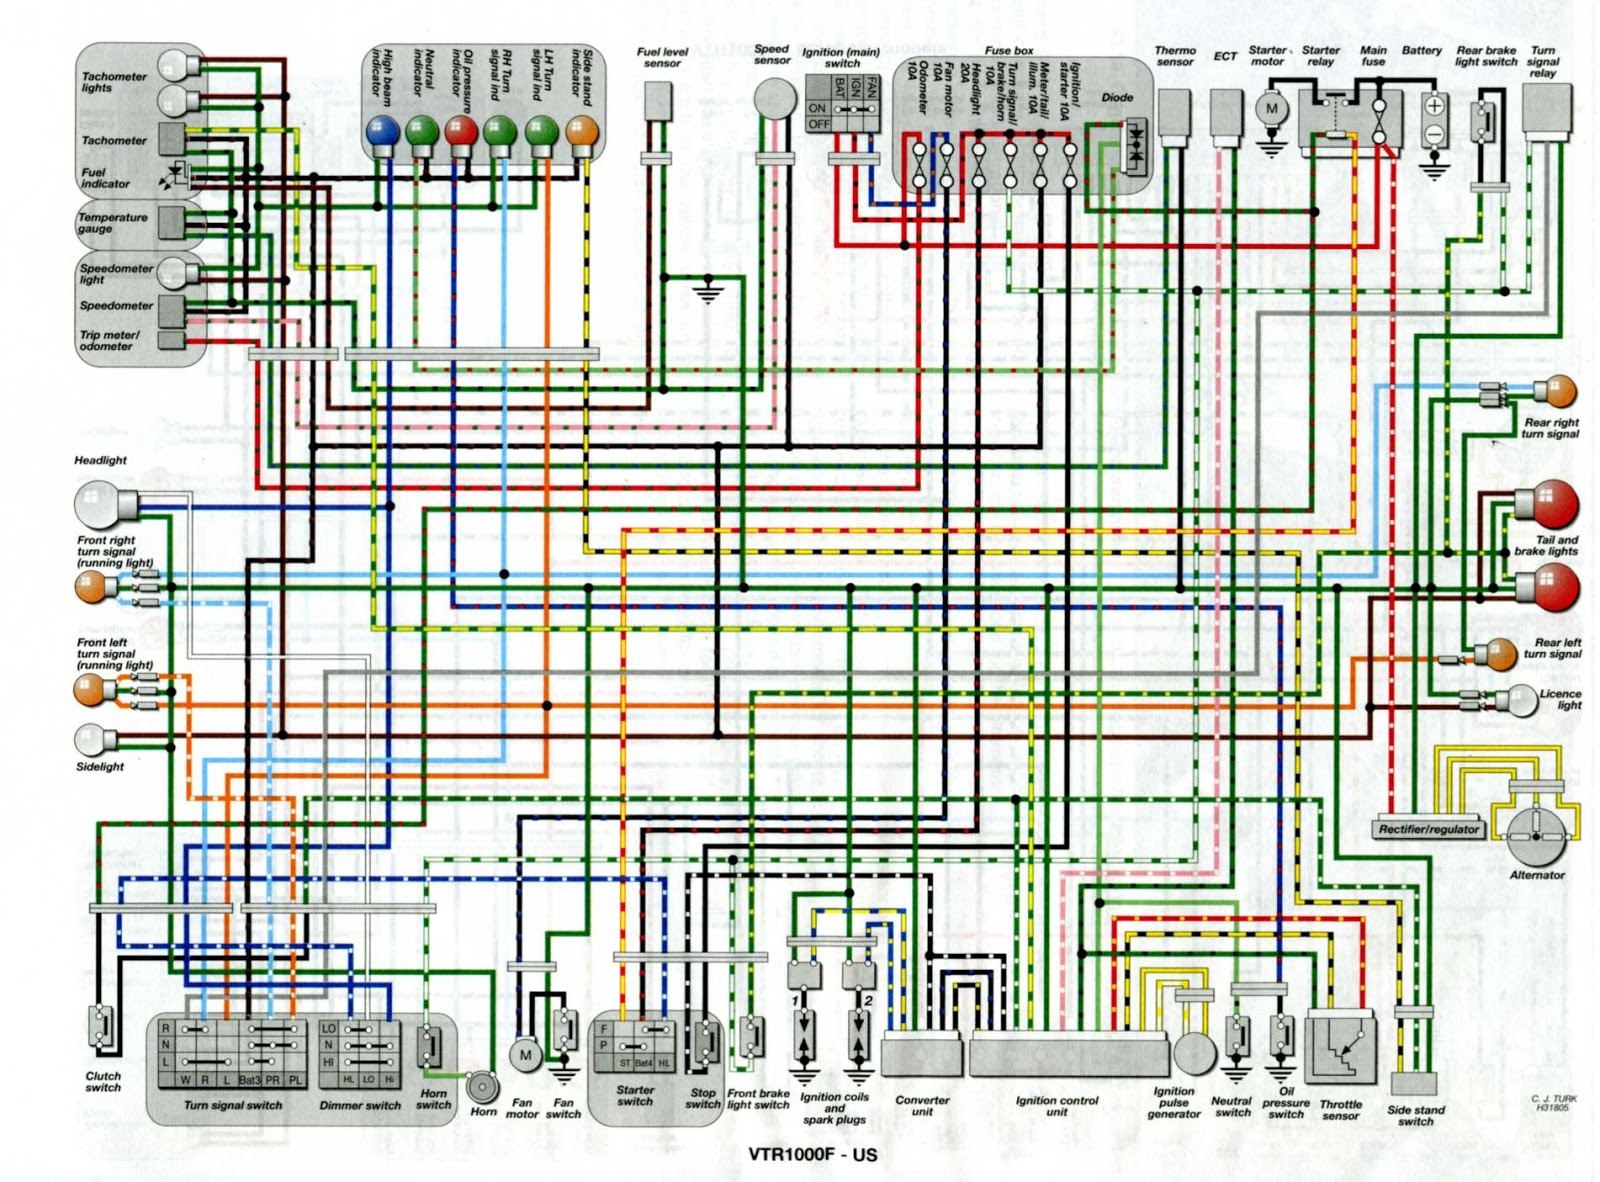 1975 cb750f super sport rebuild 03 r1 wiring diagram [ 1600 x 1182 Pixel ]